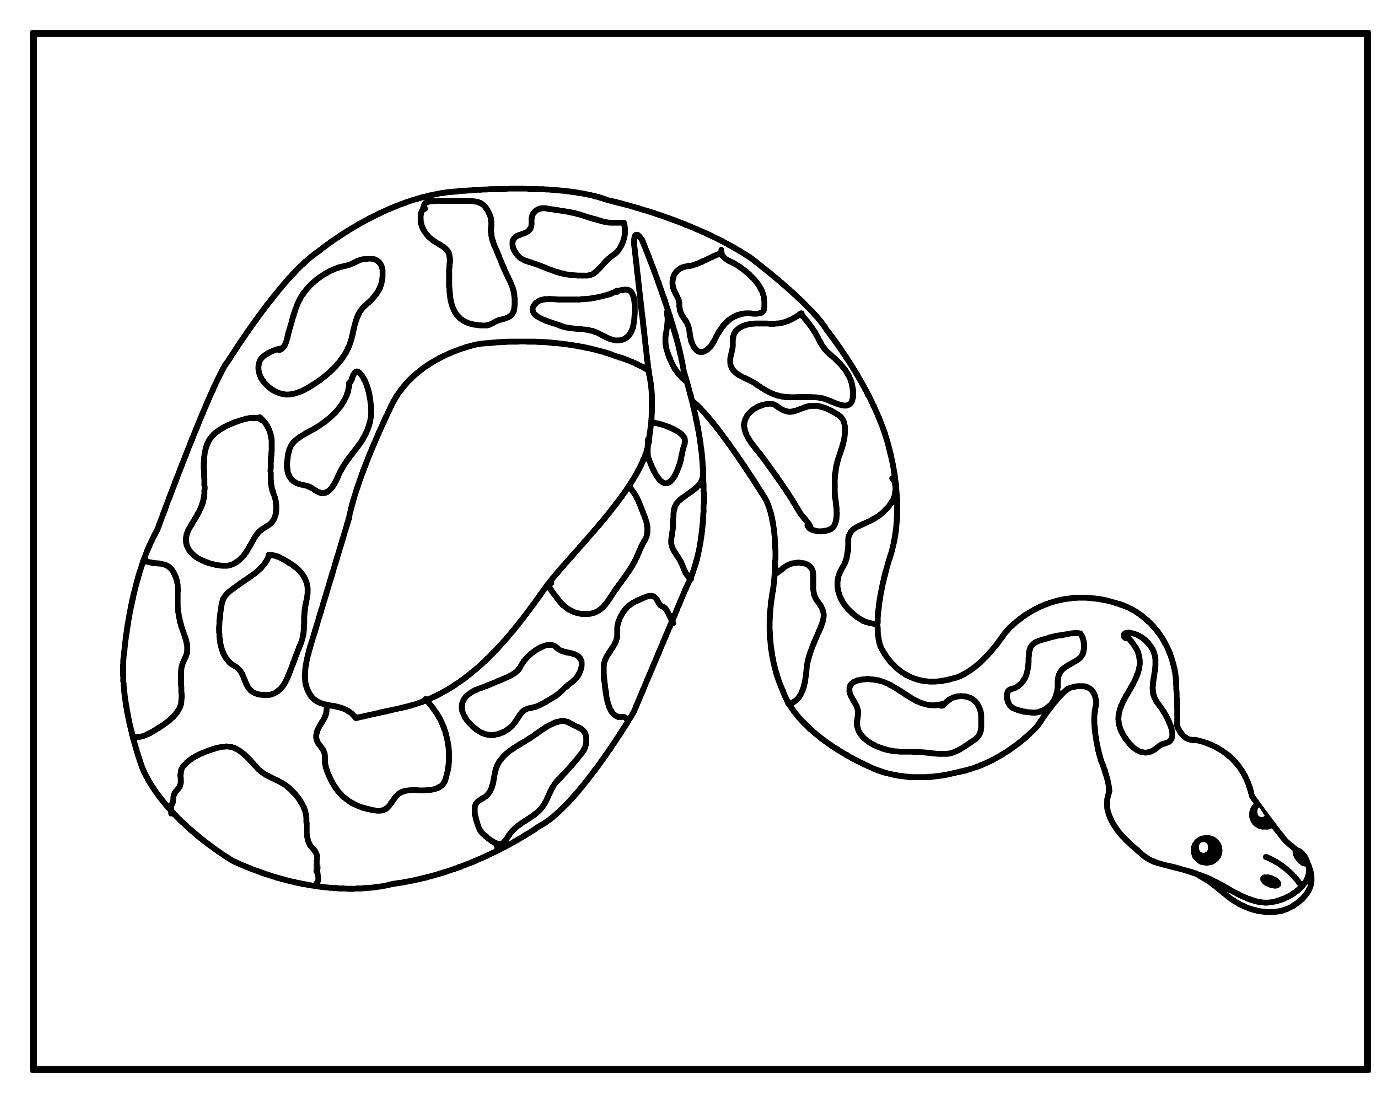 Página para colorir de Cobra